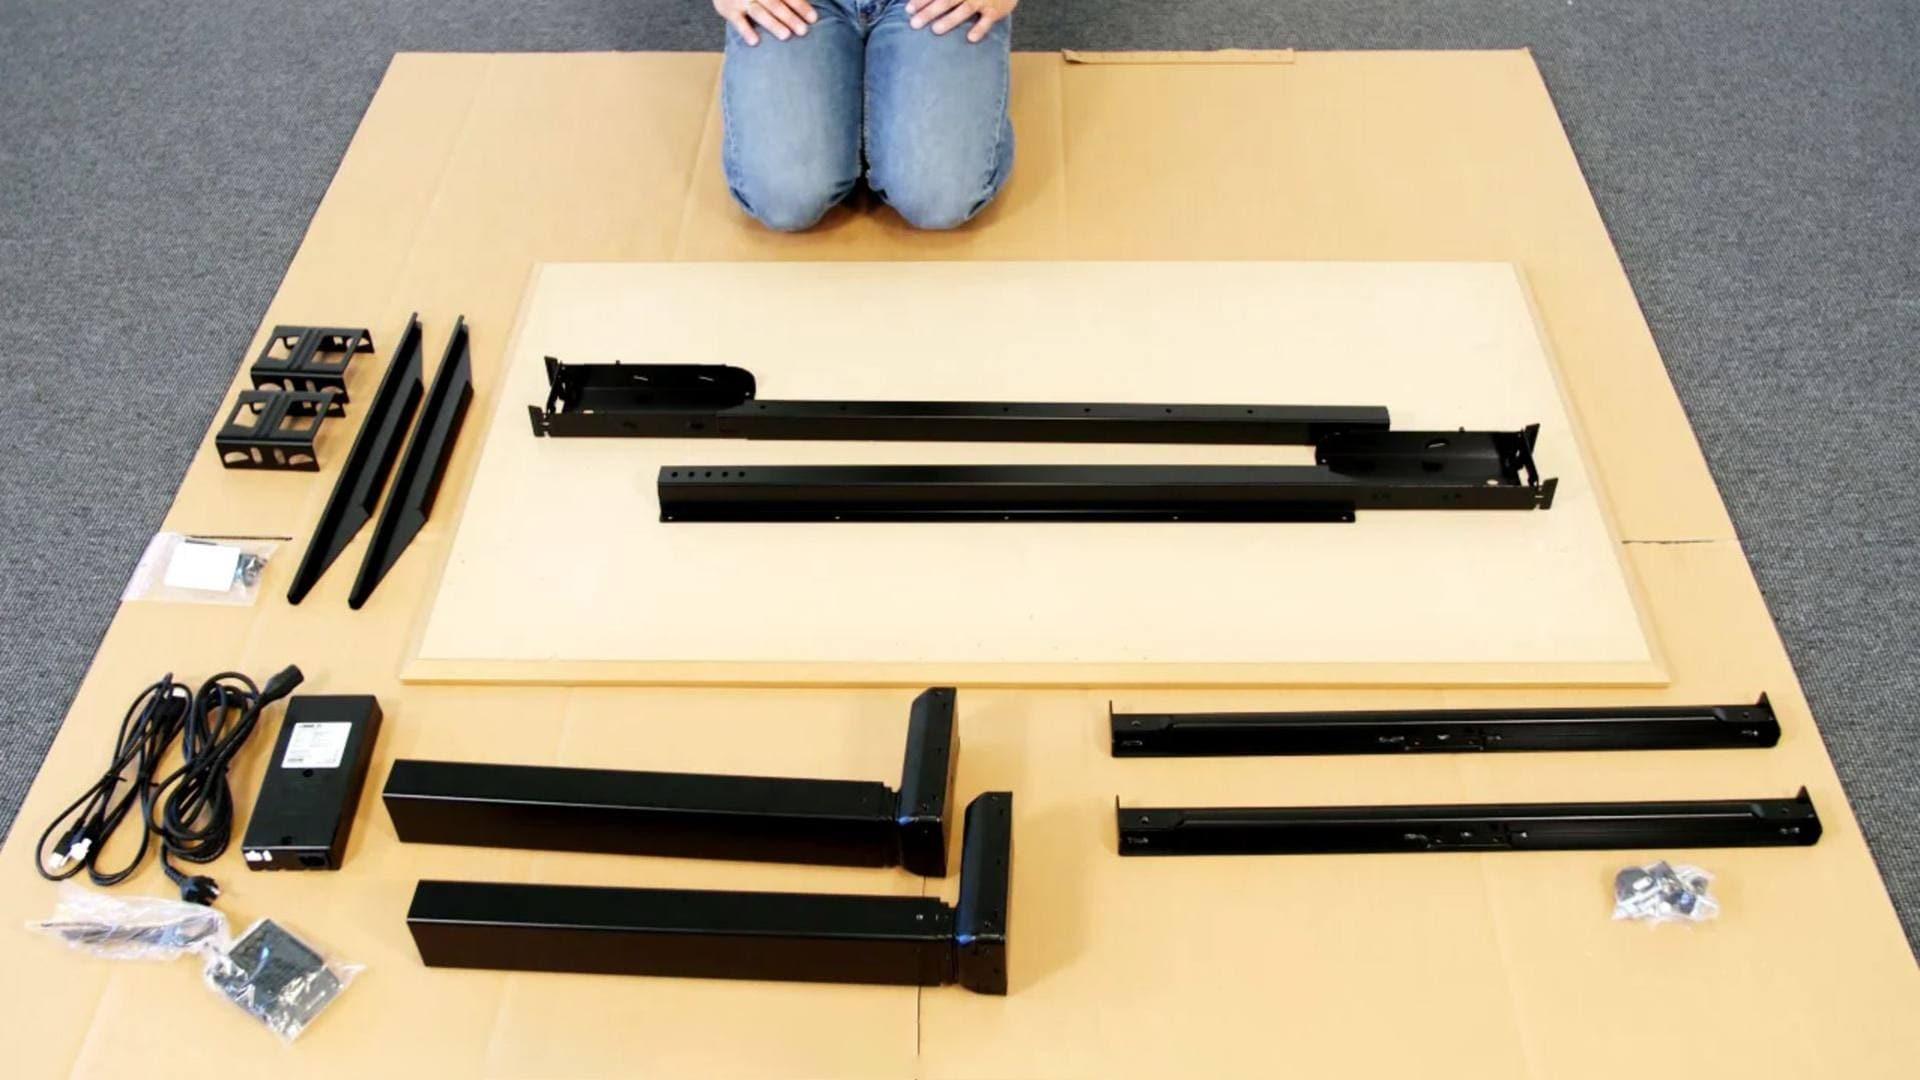 Desk Frame 1: How to assemble an office desk